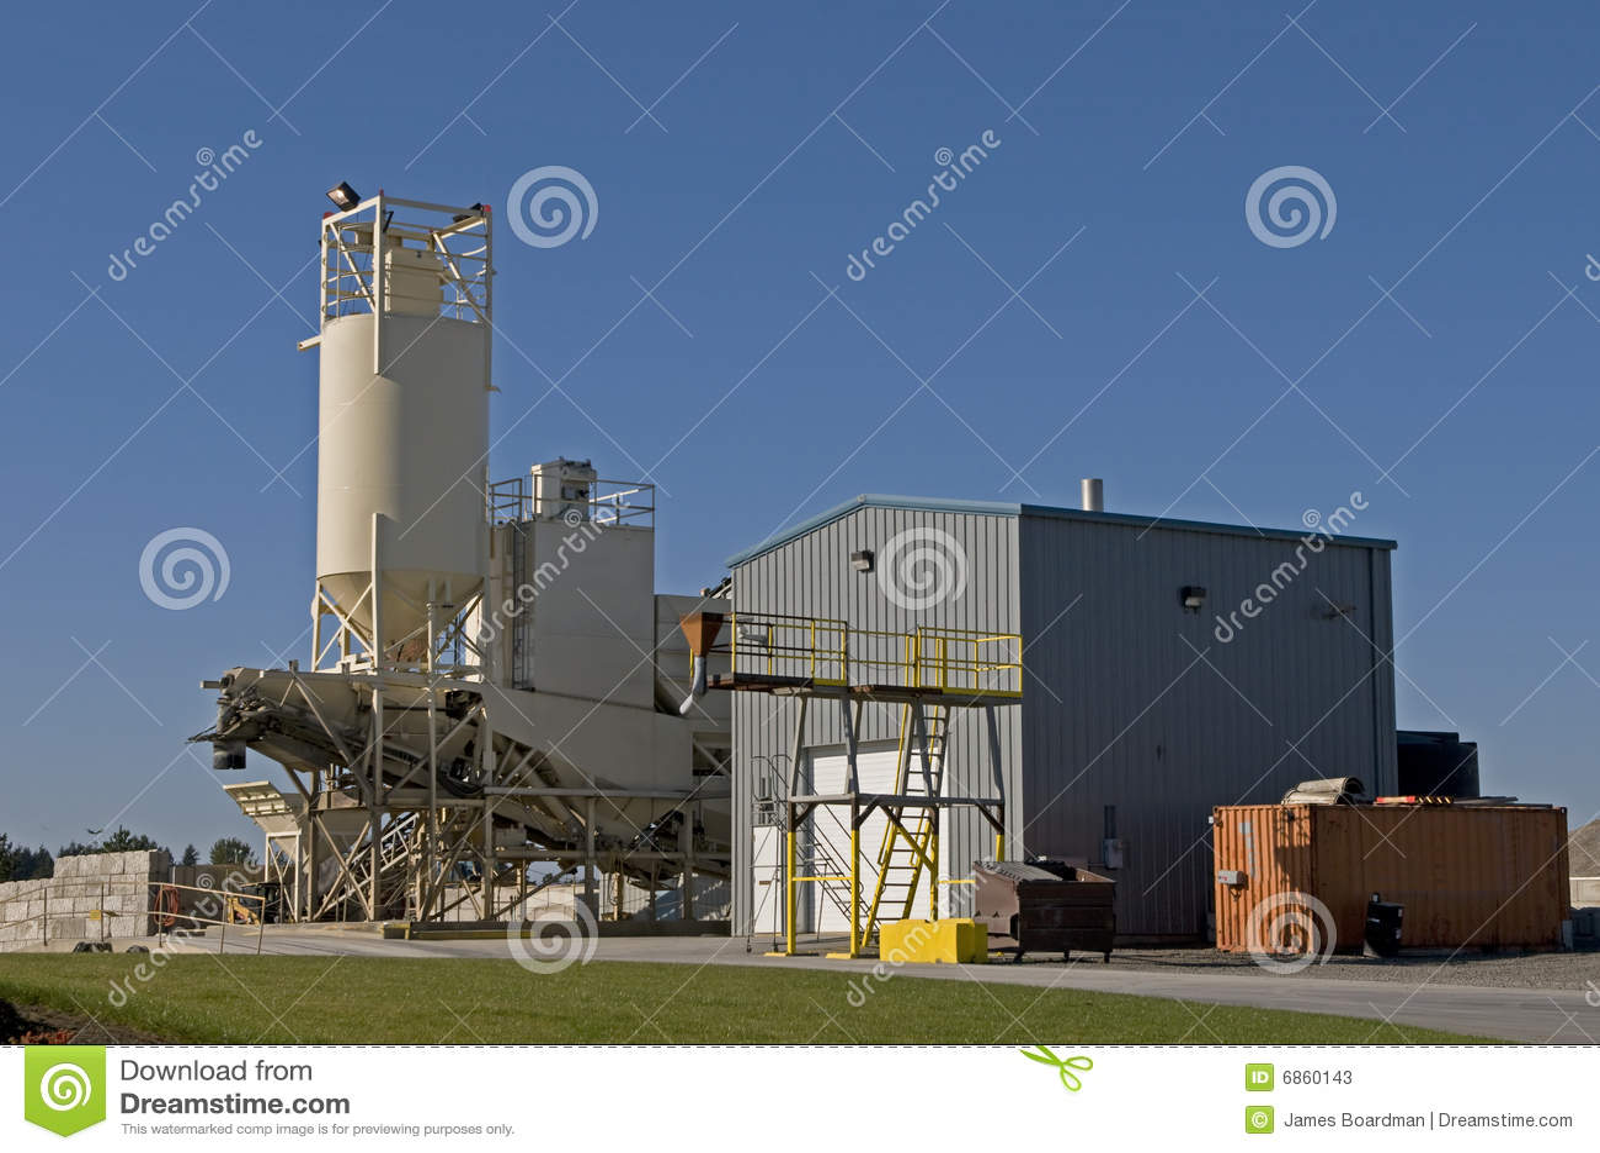 Concrete Mixing Animation : Concrete mixing facility stock photos image